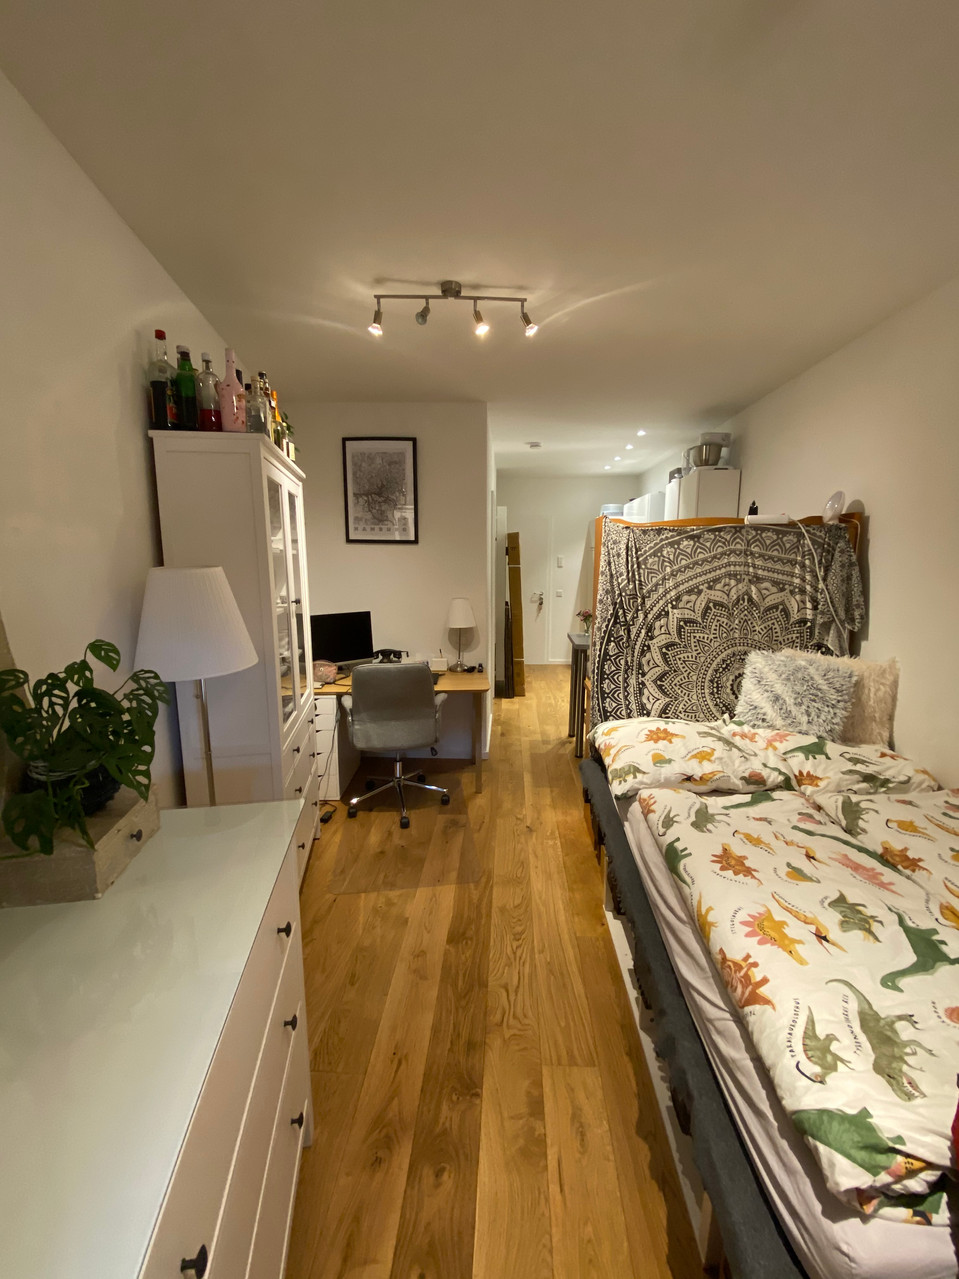 Hochwertige 1-Zimmer-Wohnung in denkmalgeschütztem Mehrfamilienhaus I Aachen-Lousberg